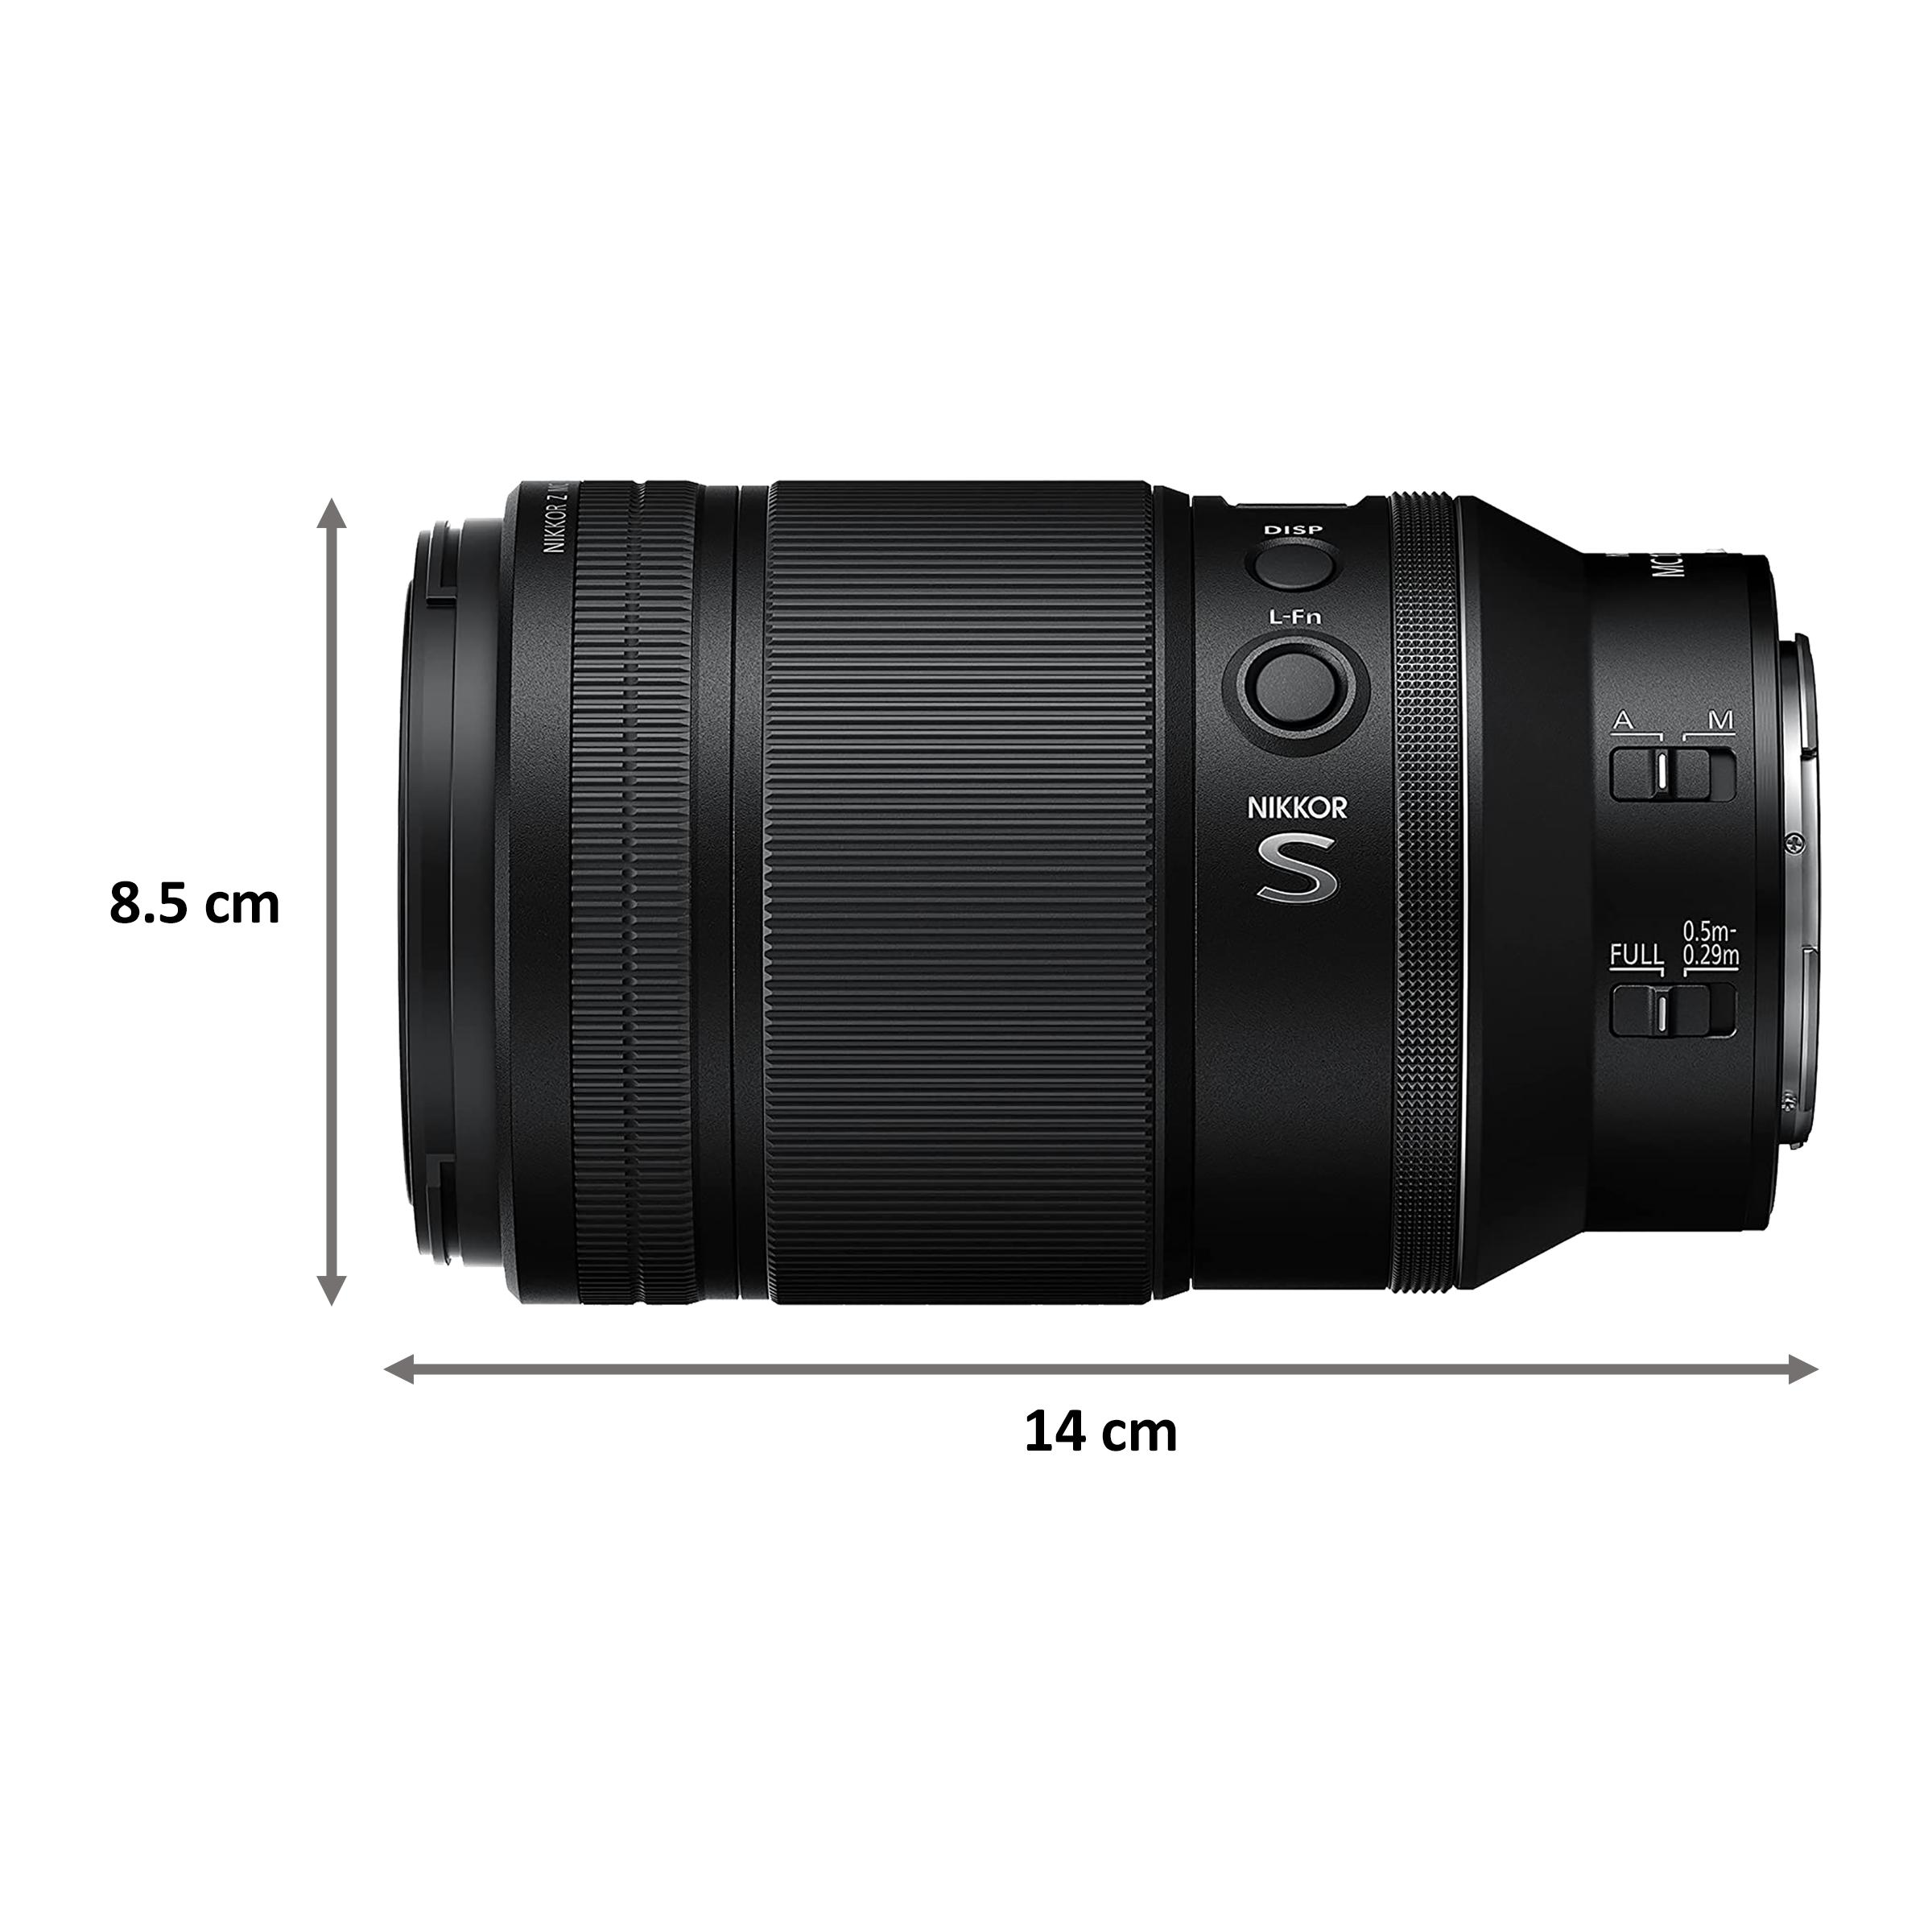 Lens - Nikon Nikkor Z MC 105mm f/2.8 VR S105 mm F32-F2.8 Macro Lens (1:1 Magnification, JMA602DA, Black)_2